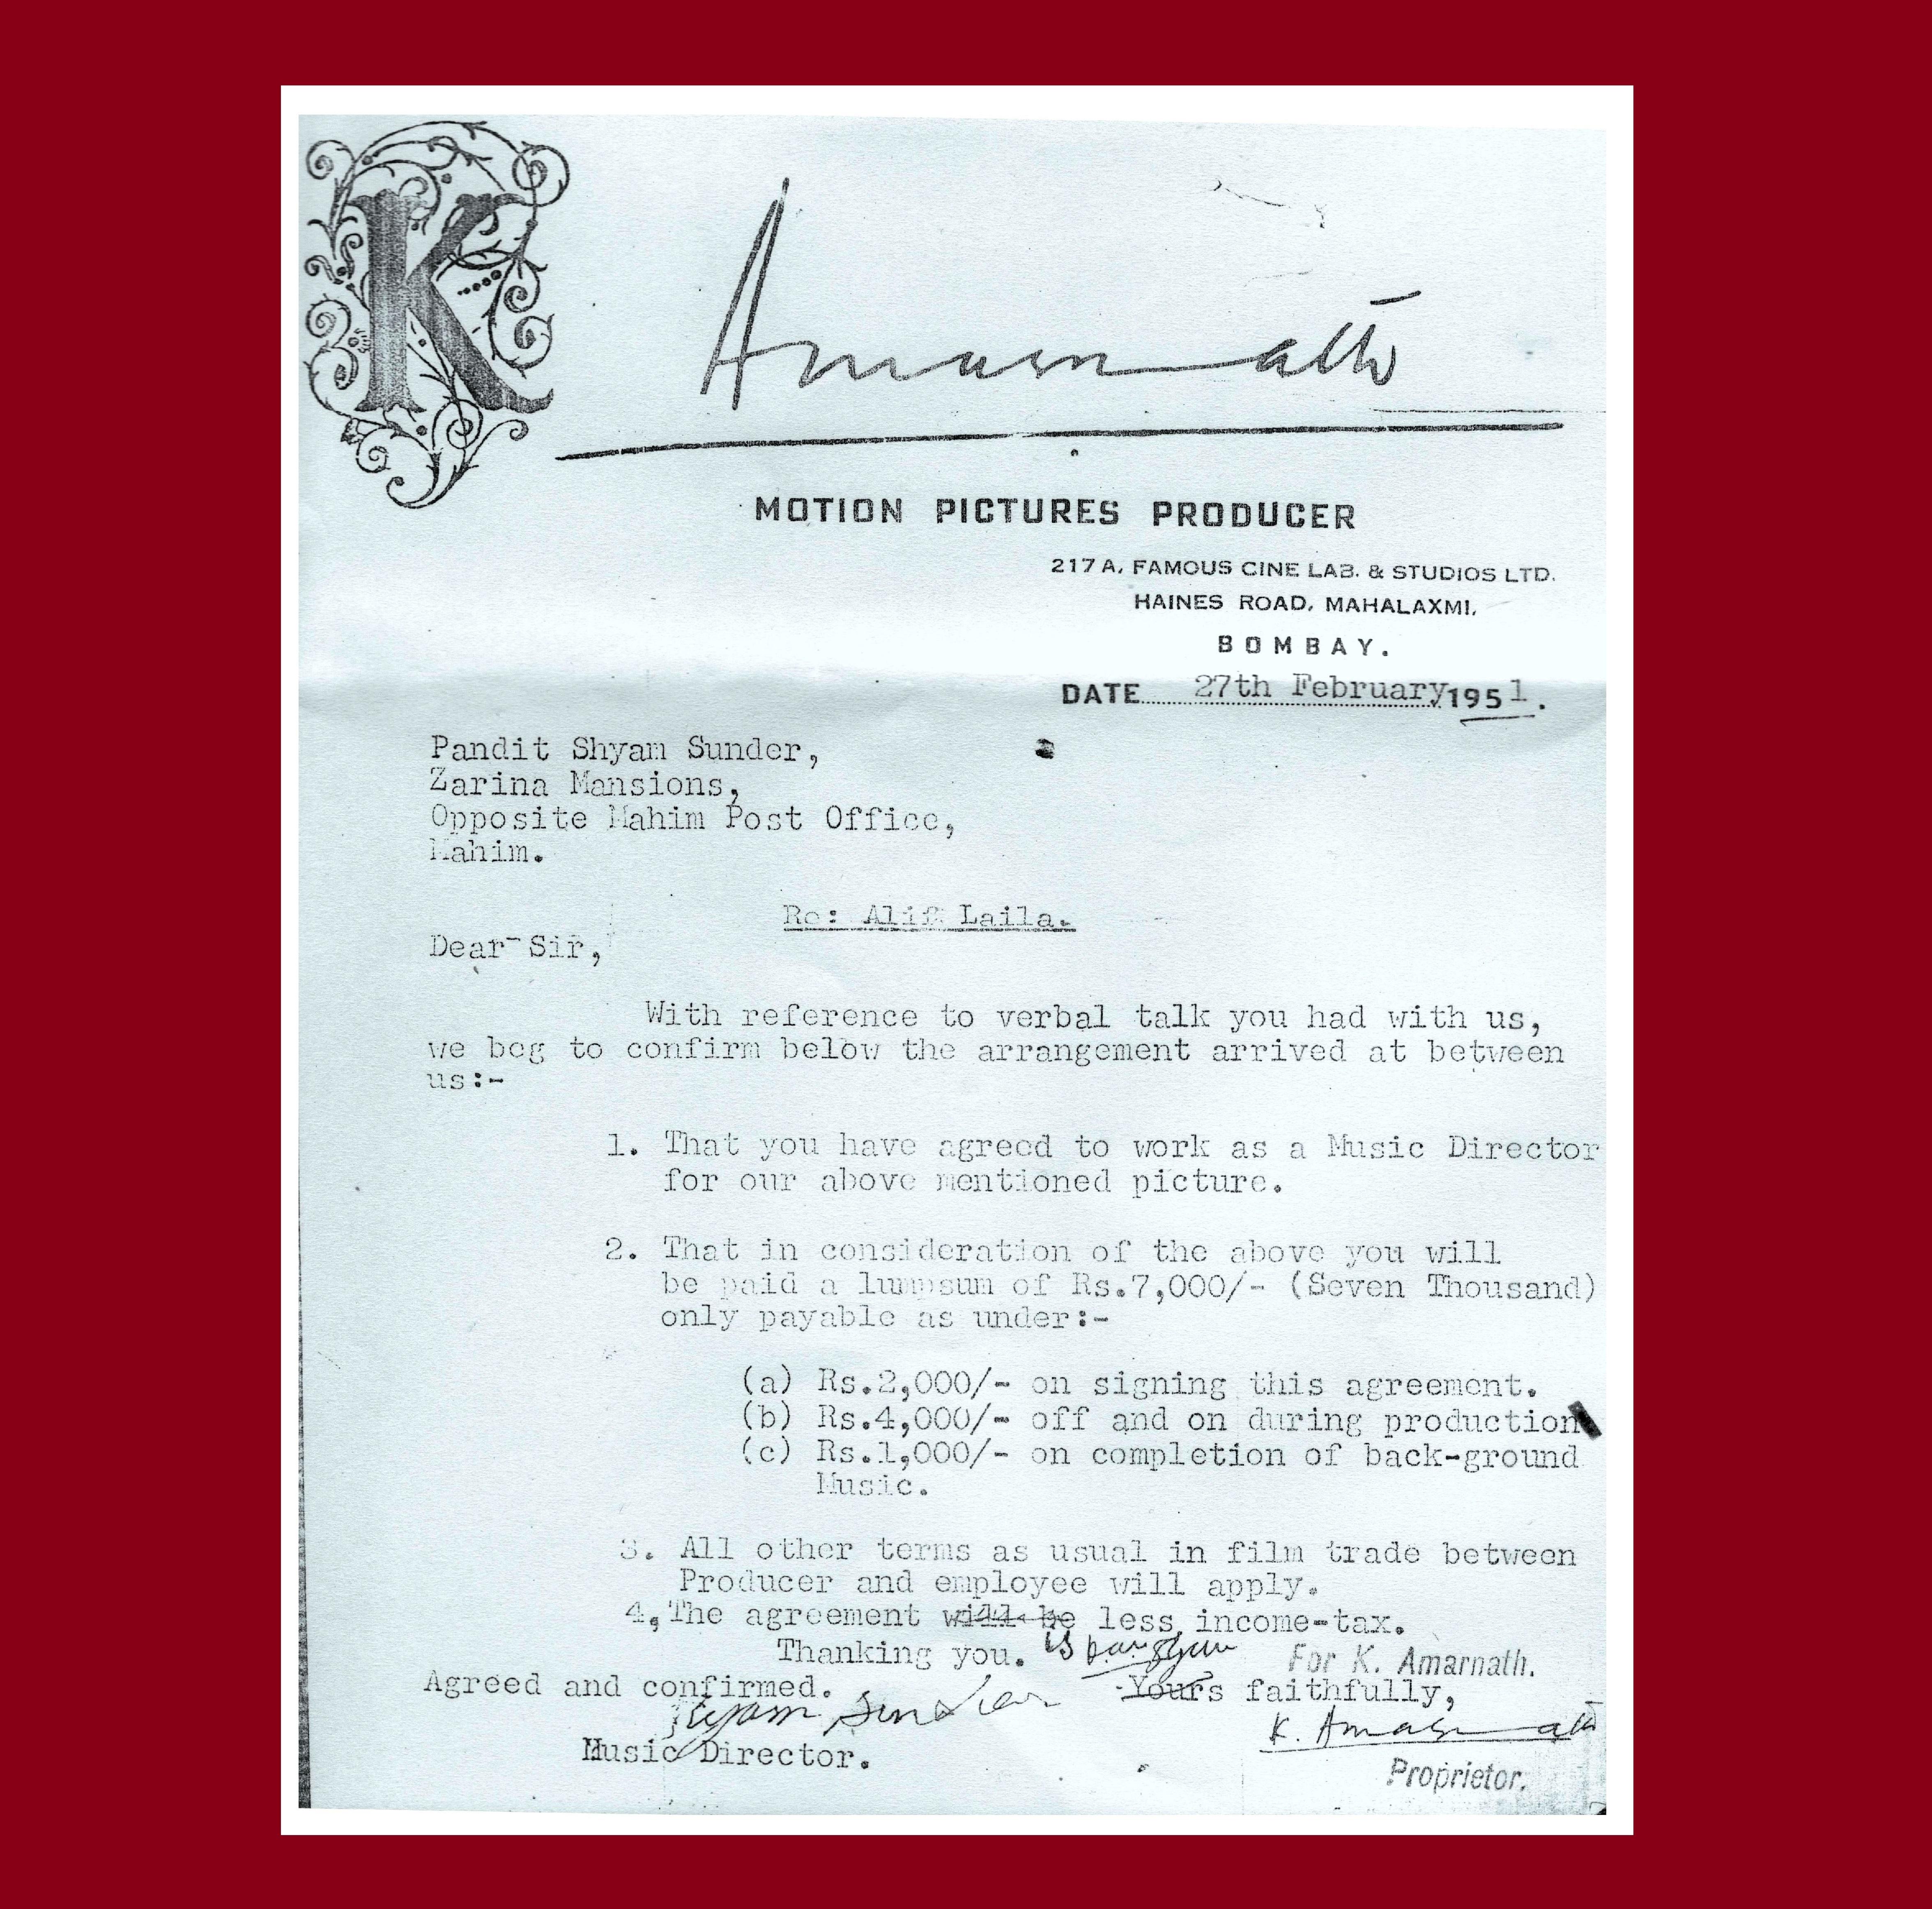 Contract 1951 - Shyam Sundar - Alif-Laila